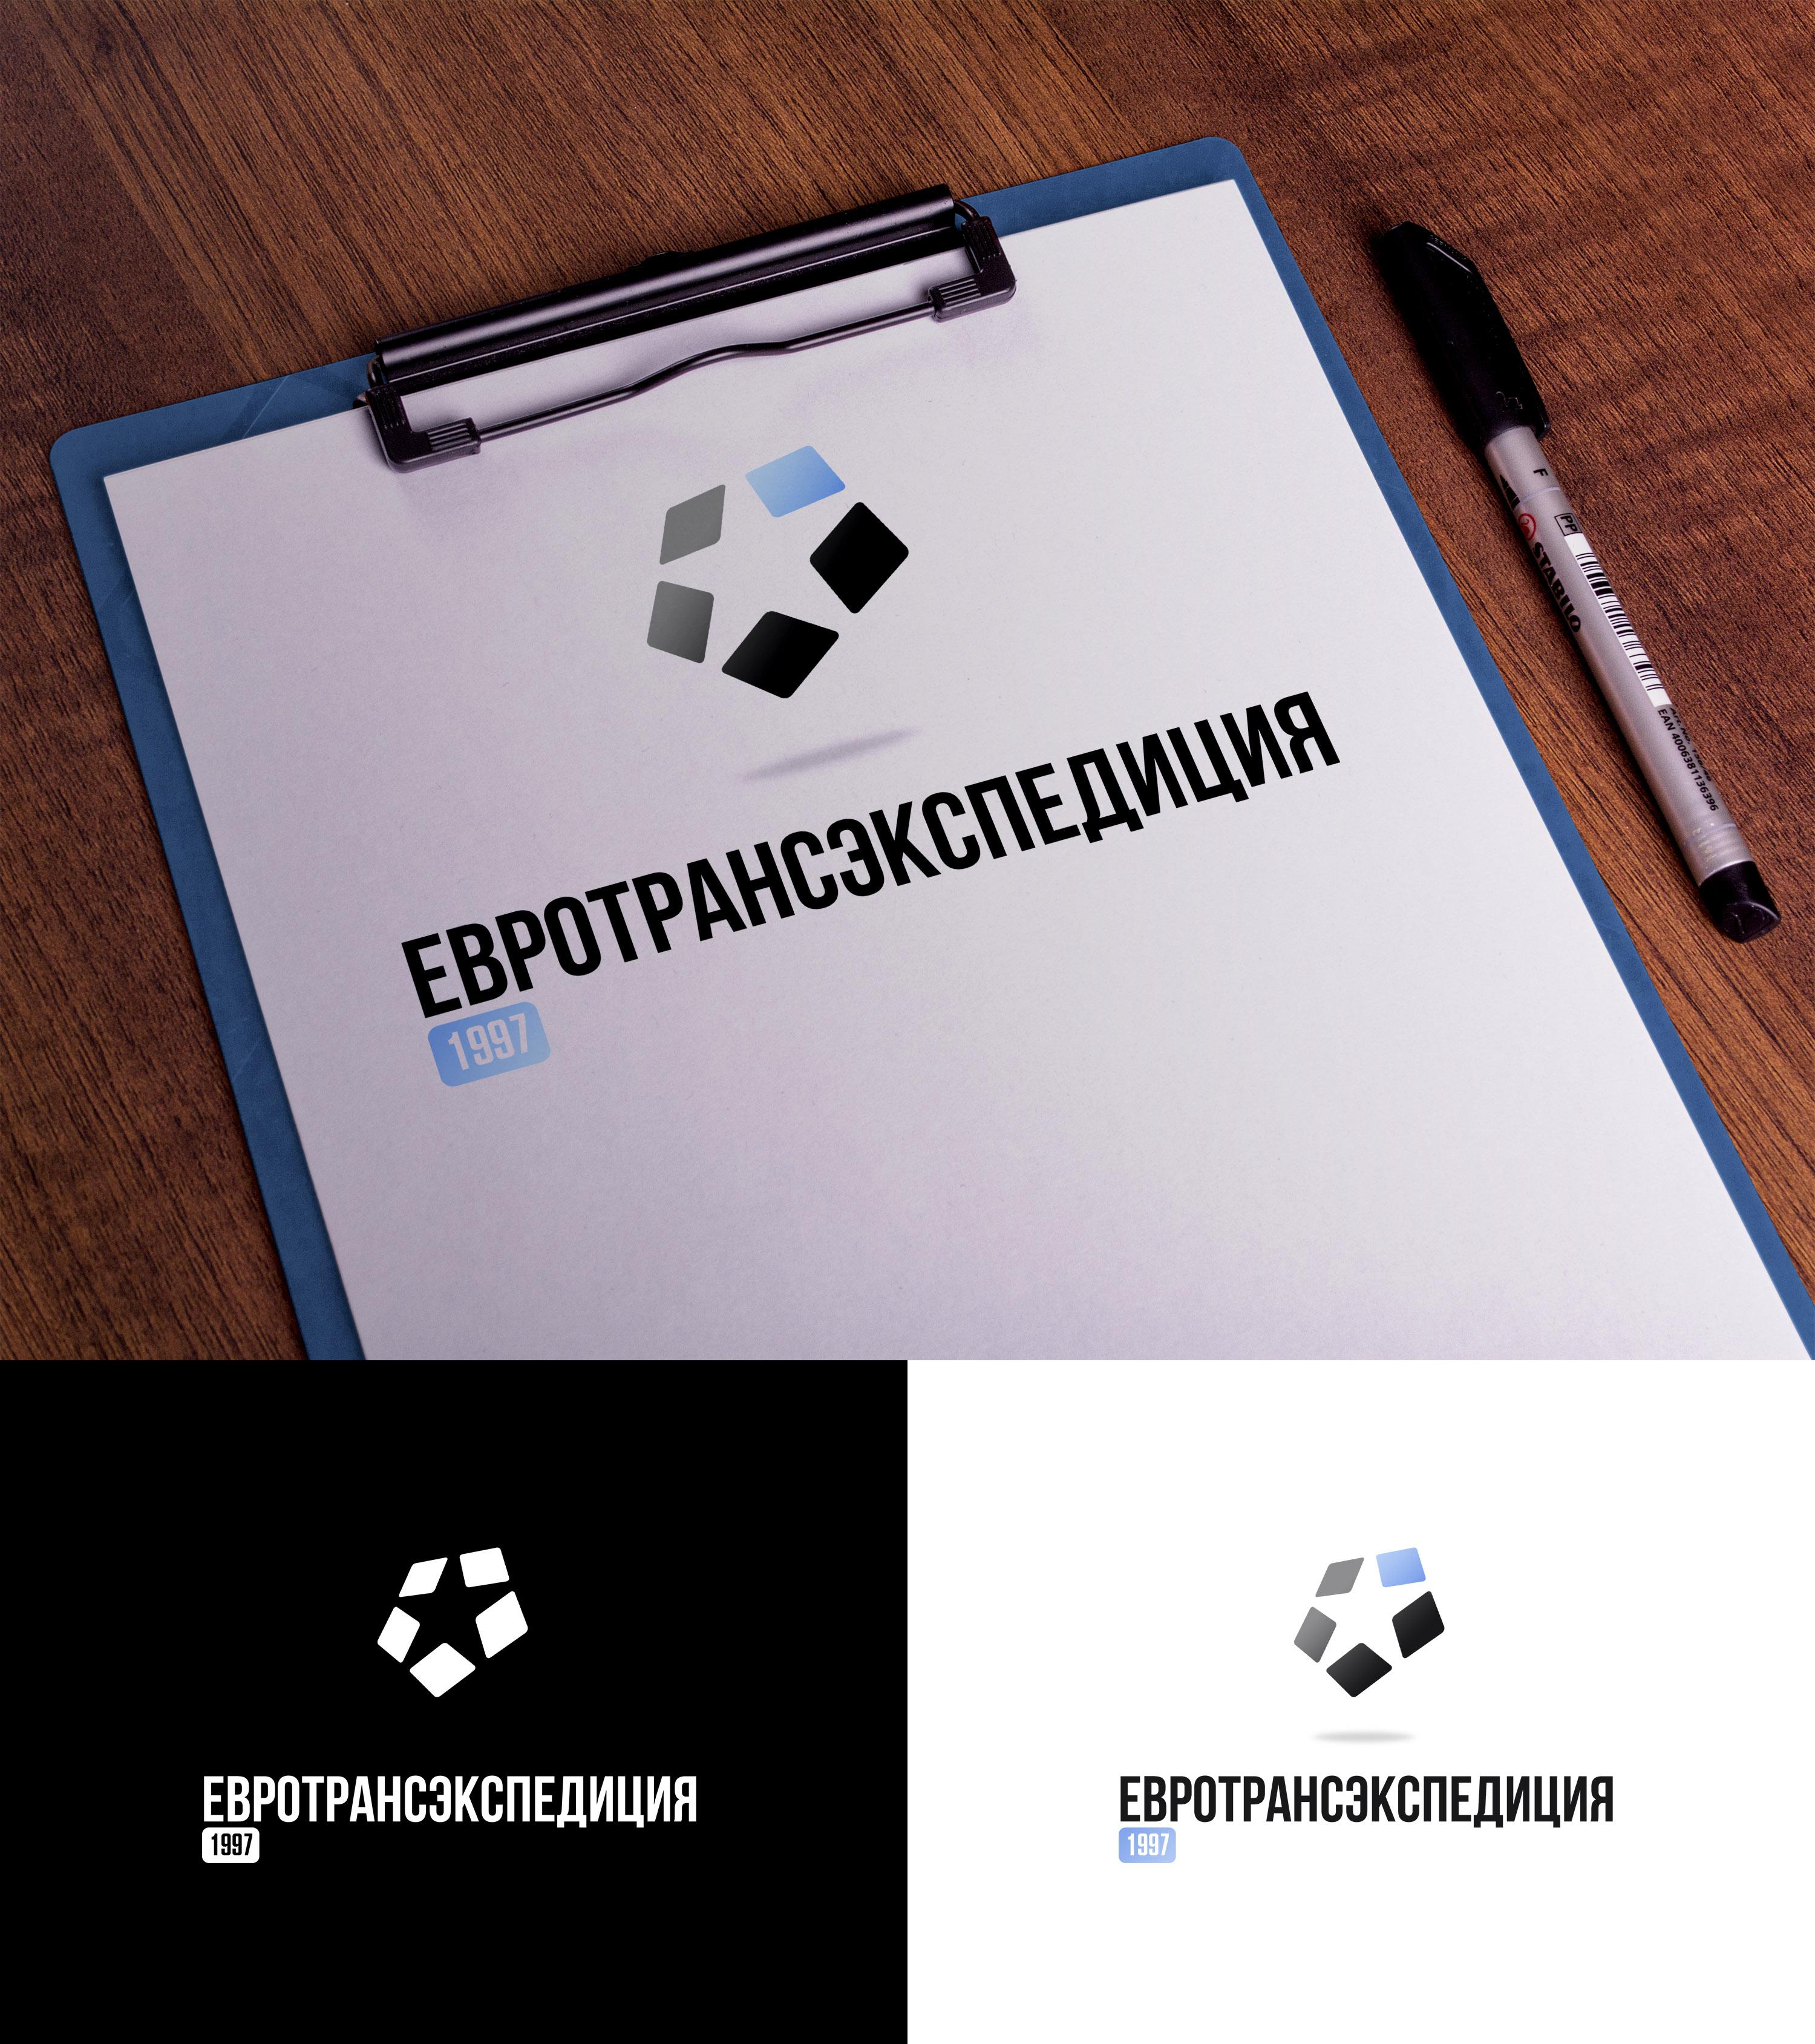 Предложите эволюцию логотипа экспедиторской компании  фото f_2375900ff9aaeafa.jpg